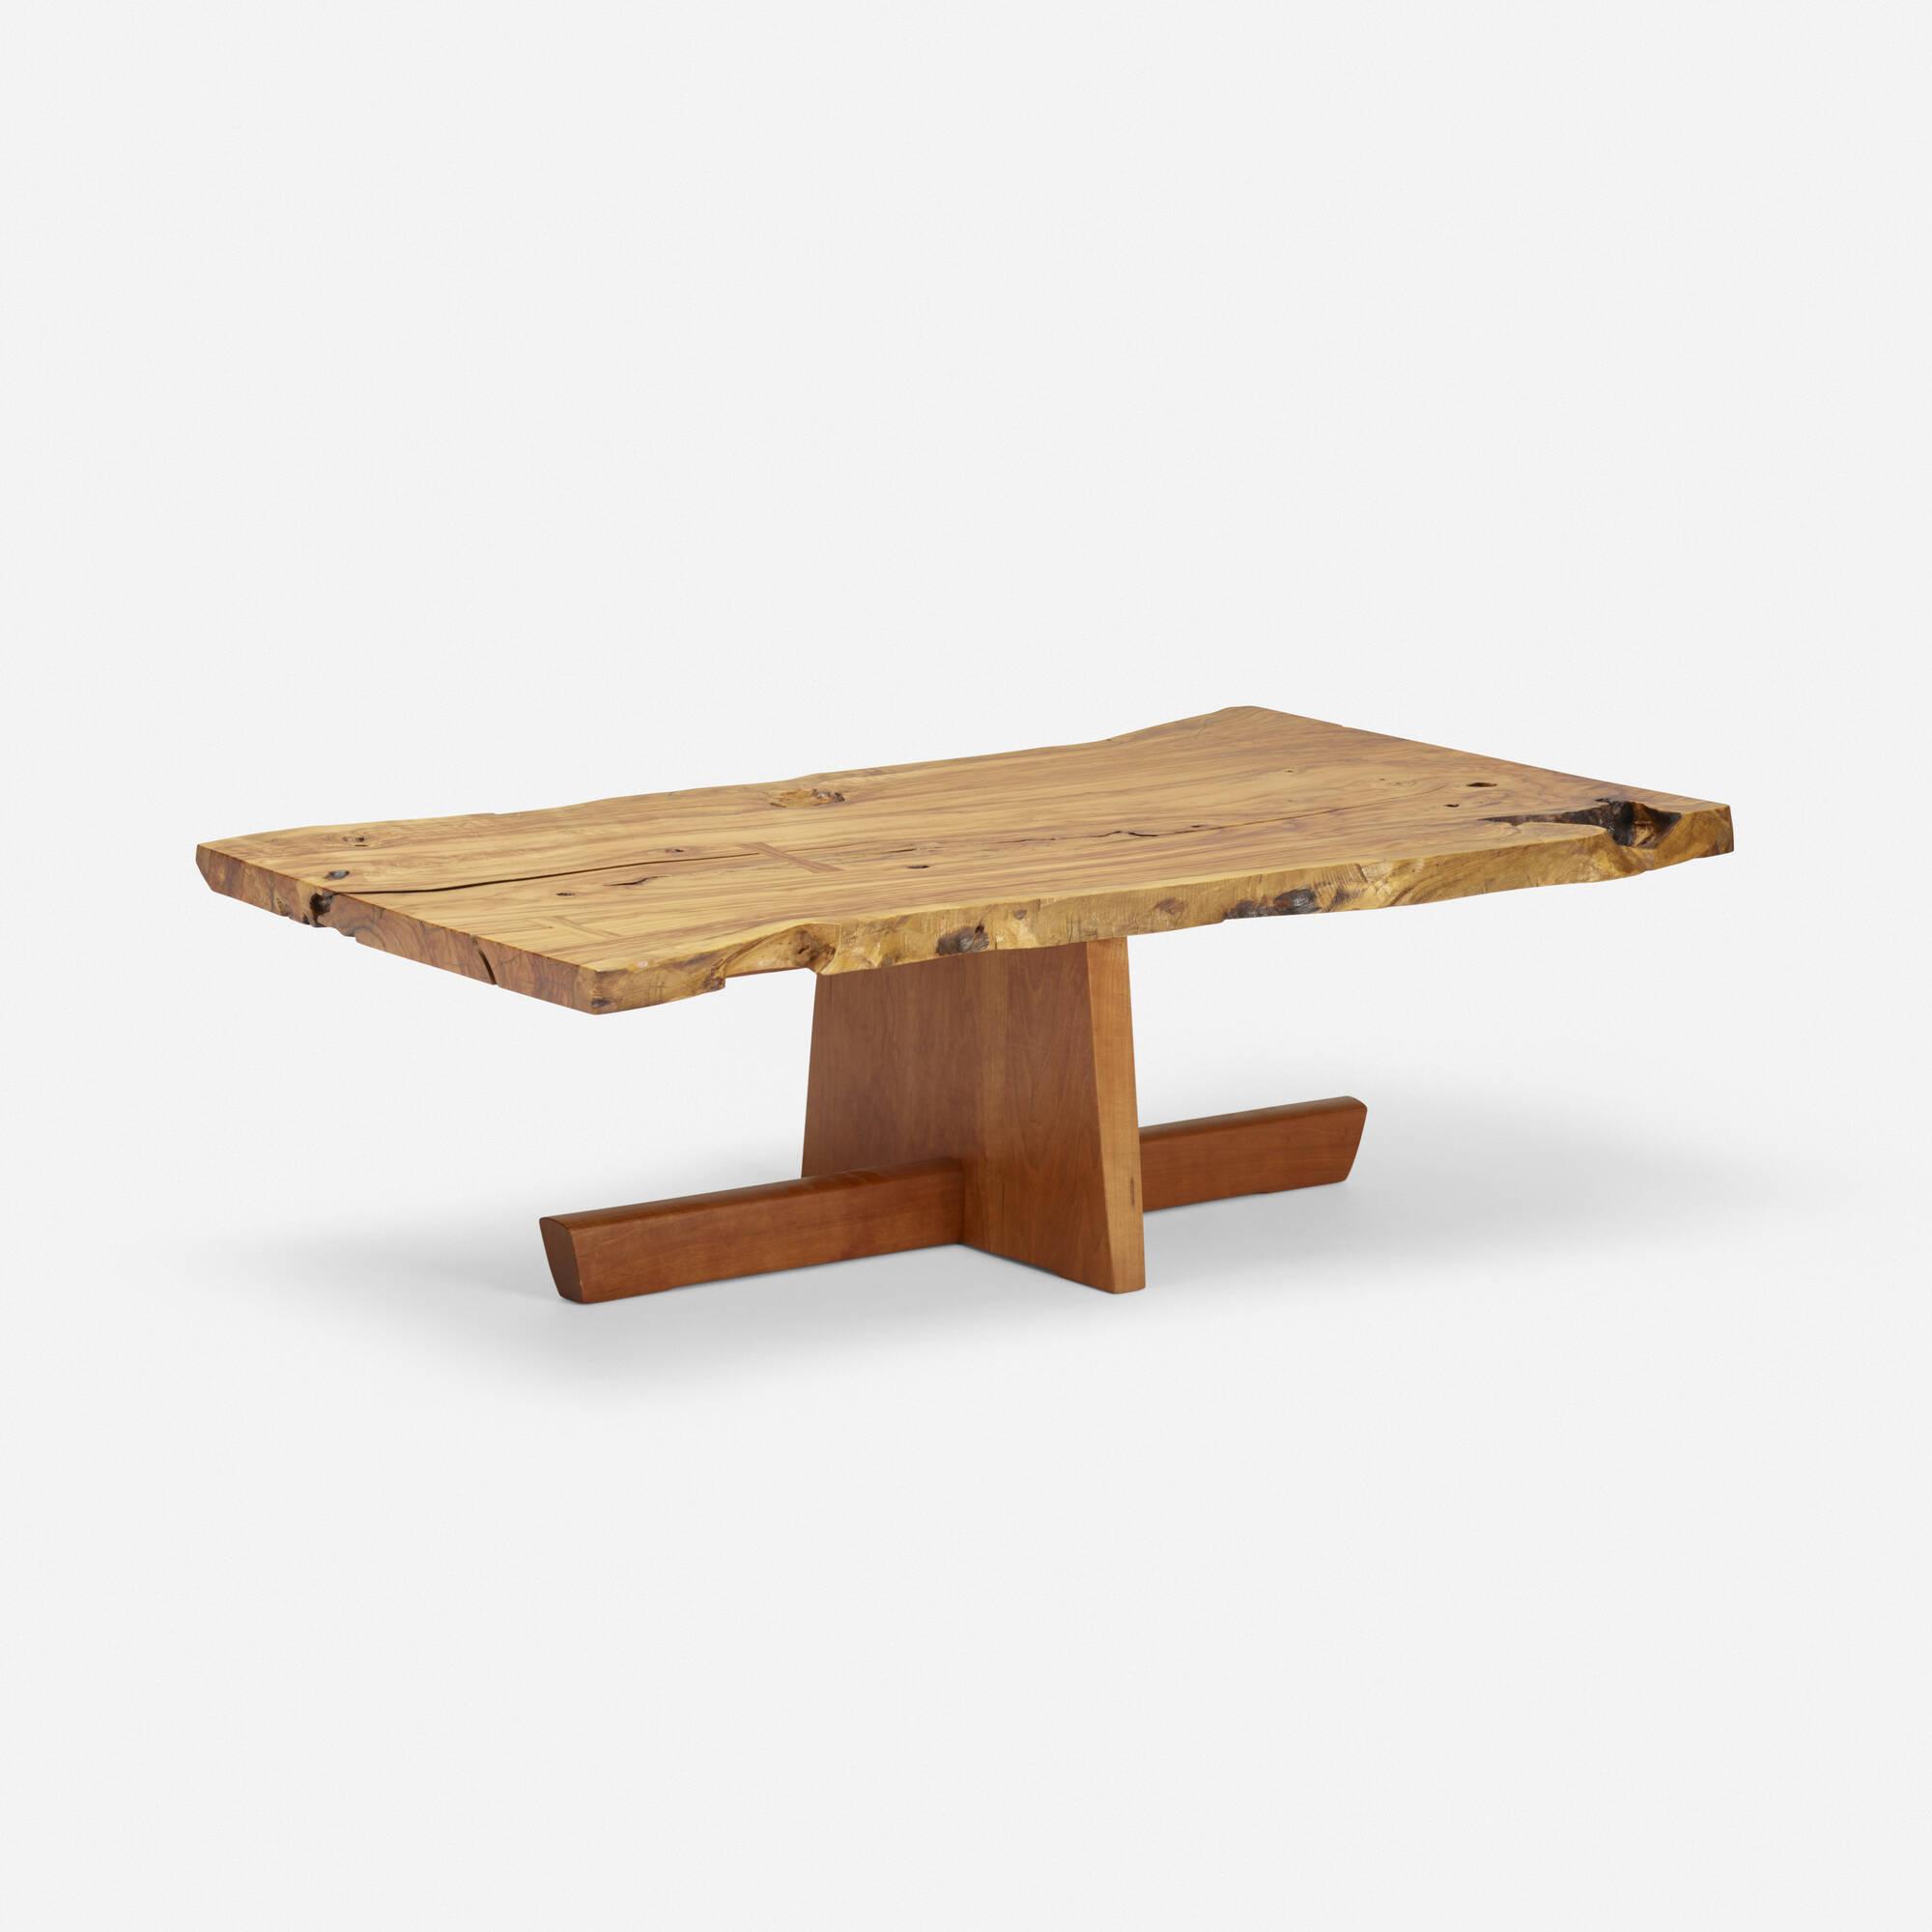 126: Mira Nakashima / Minguren I coffee table (1 of 4)